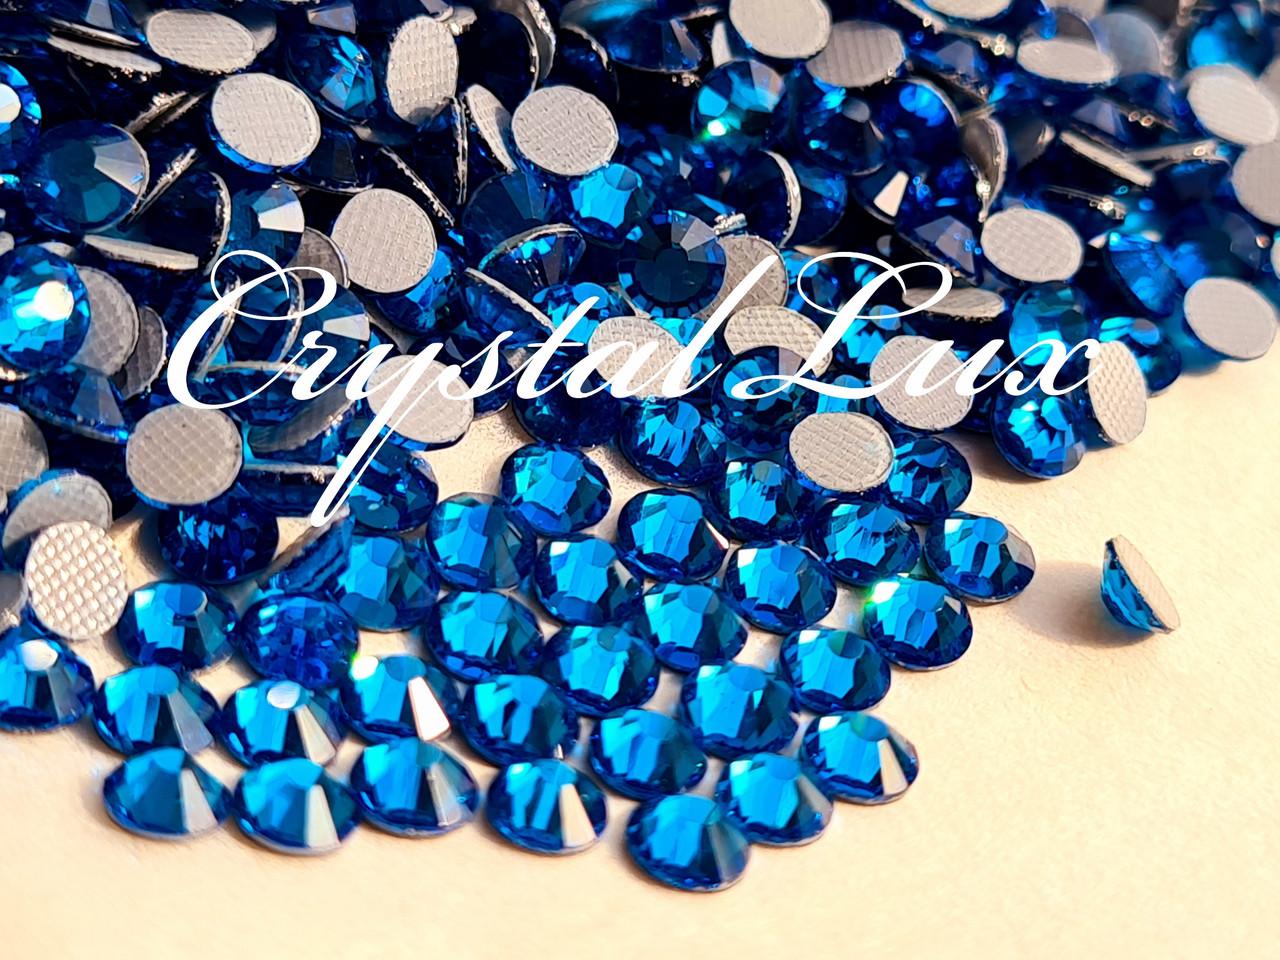 Термо стразы Lux ss16 Capri Blue (4.0mm) 100шт